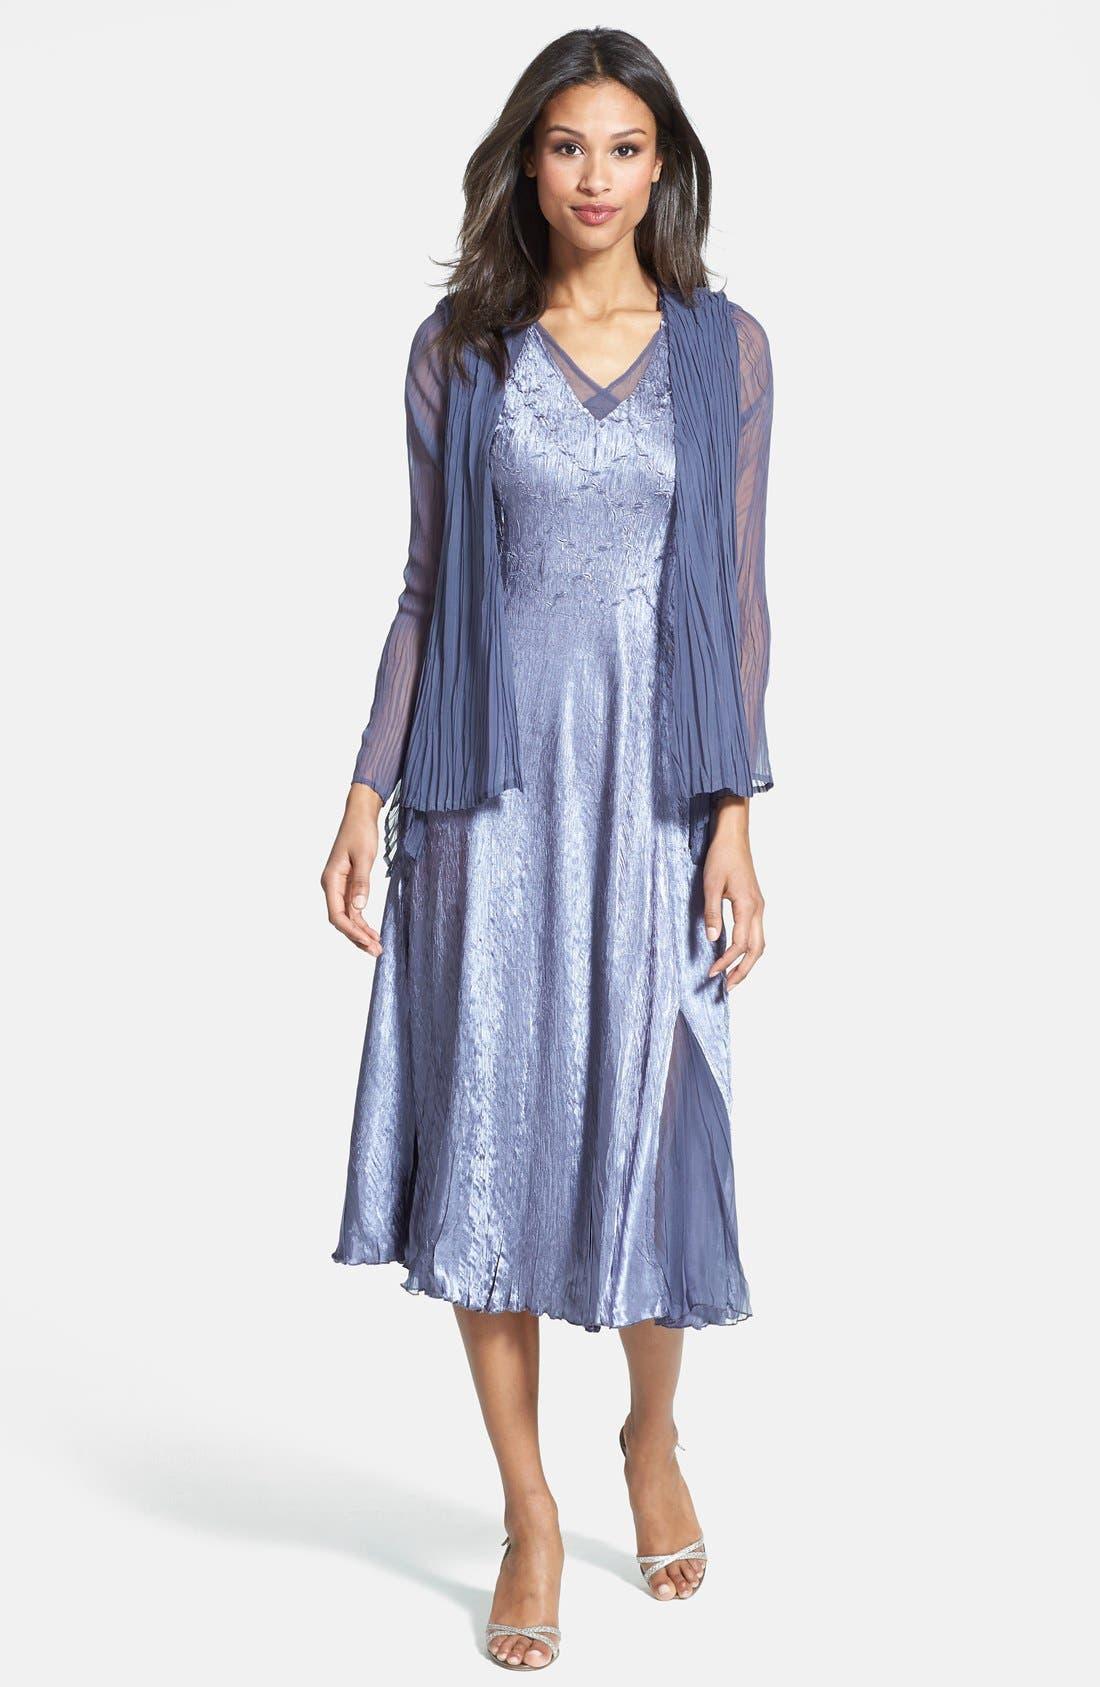 Alternate Image 1 Selected - Komarov Sleeveless Satin Dress & Chiffon Jacket